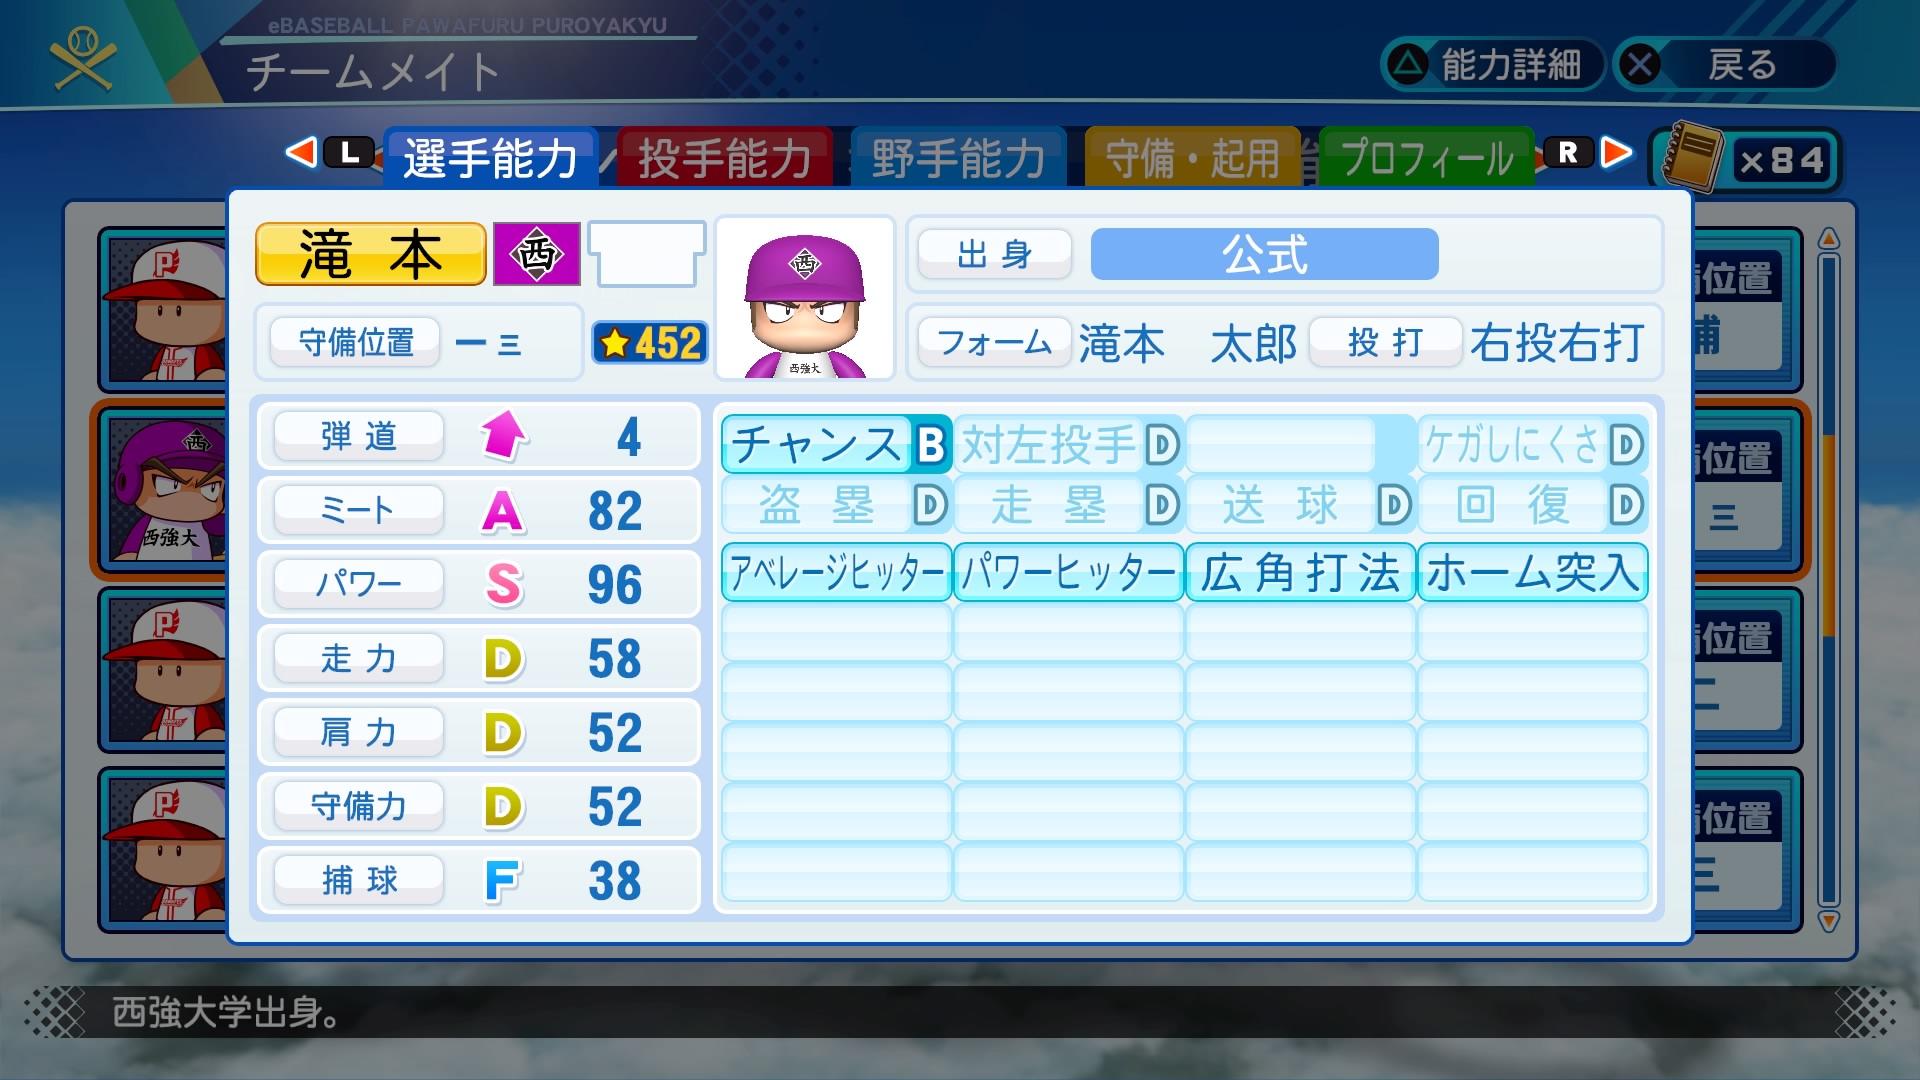 E07qV_sUcAcO5Of.jpg